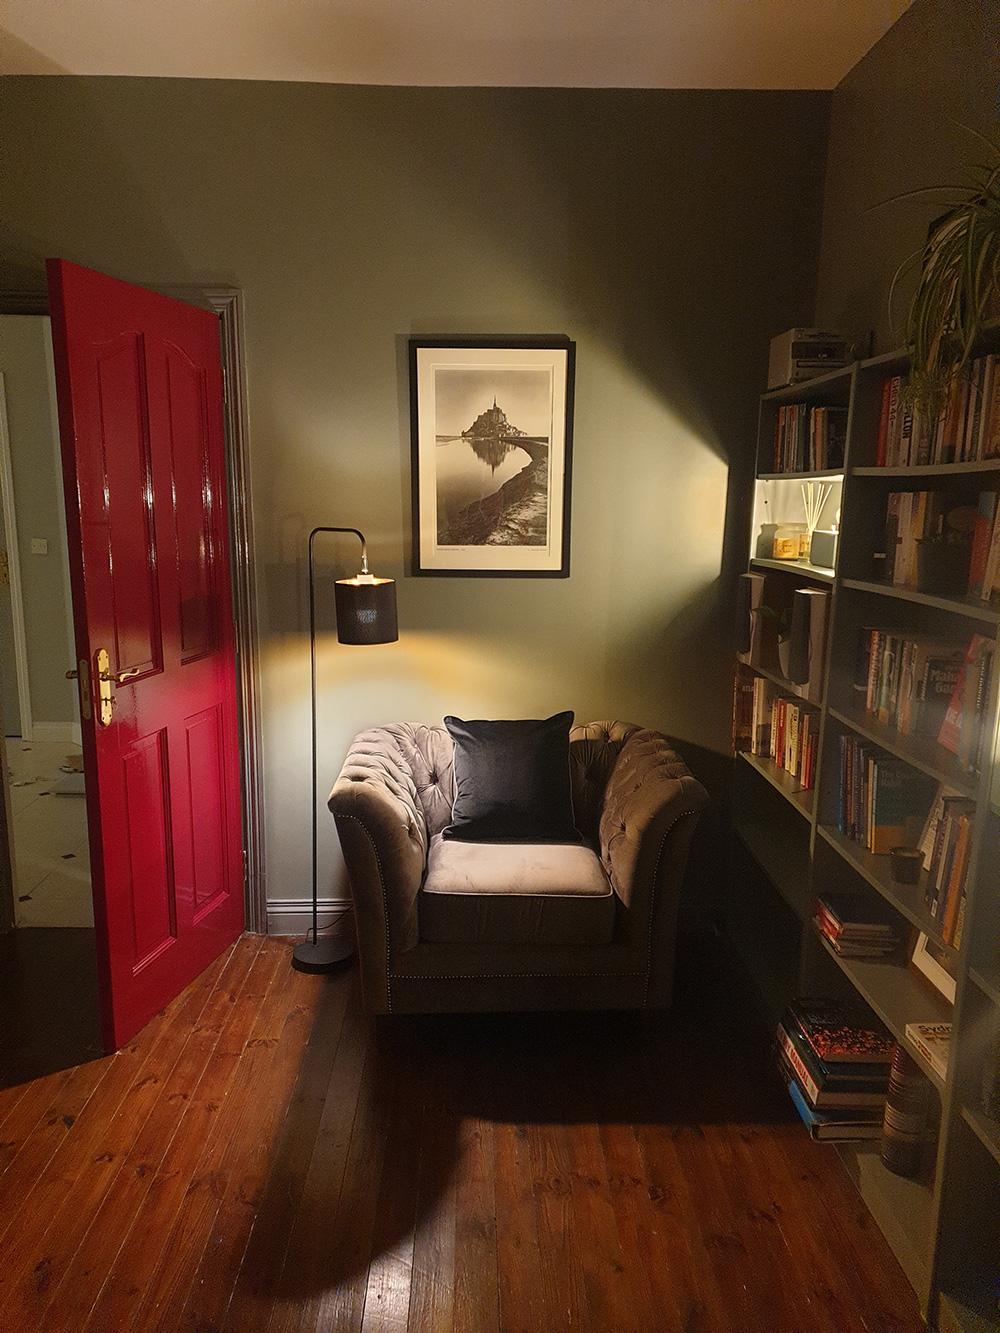 Grey Karin armchair in retro style room